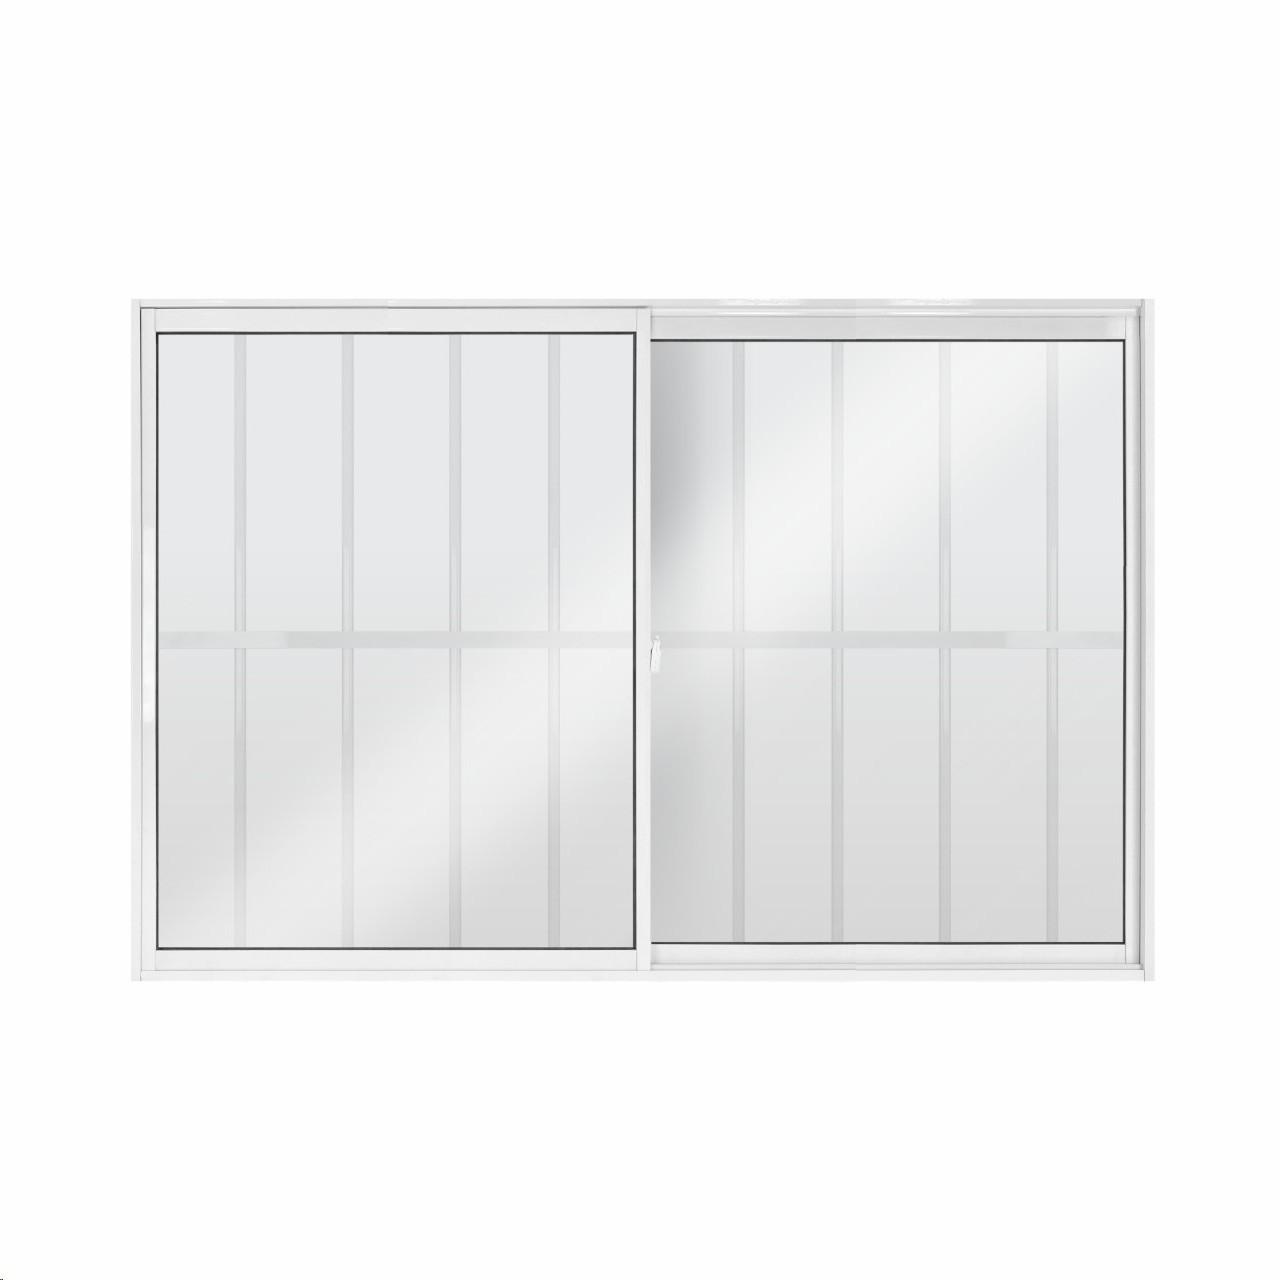 Janela de Correr Slim de Aluminio 2 Folhas com Grade 100x150cm Vidro Liso Branca - 922312 - Aluvid